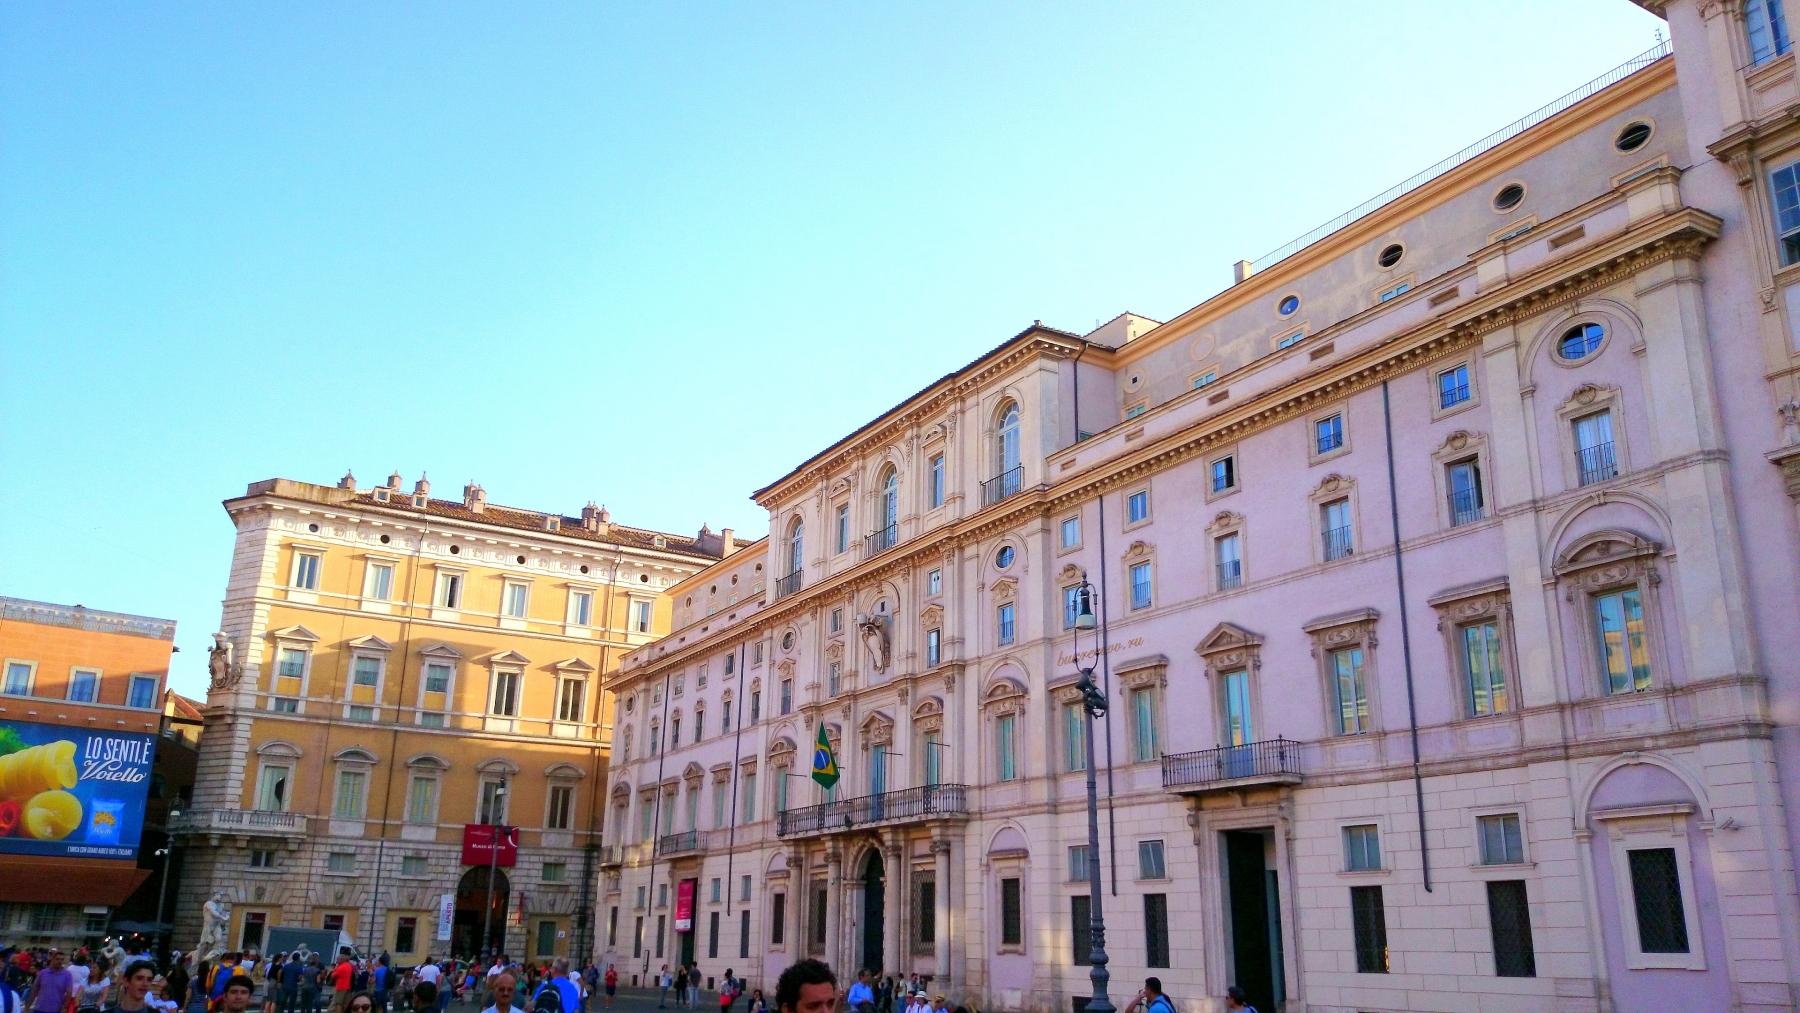 Piazza Navona 68